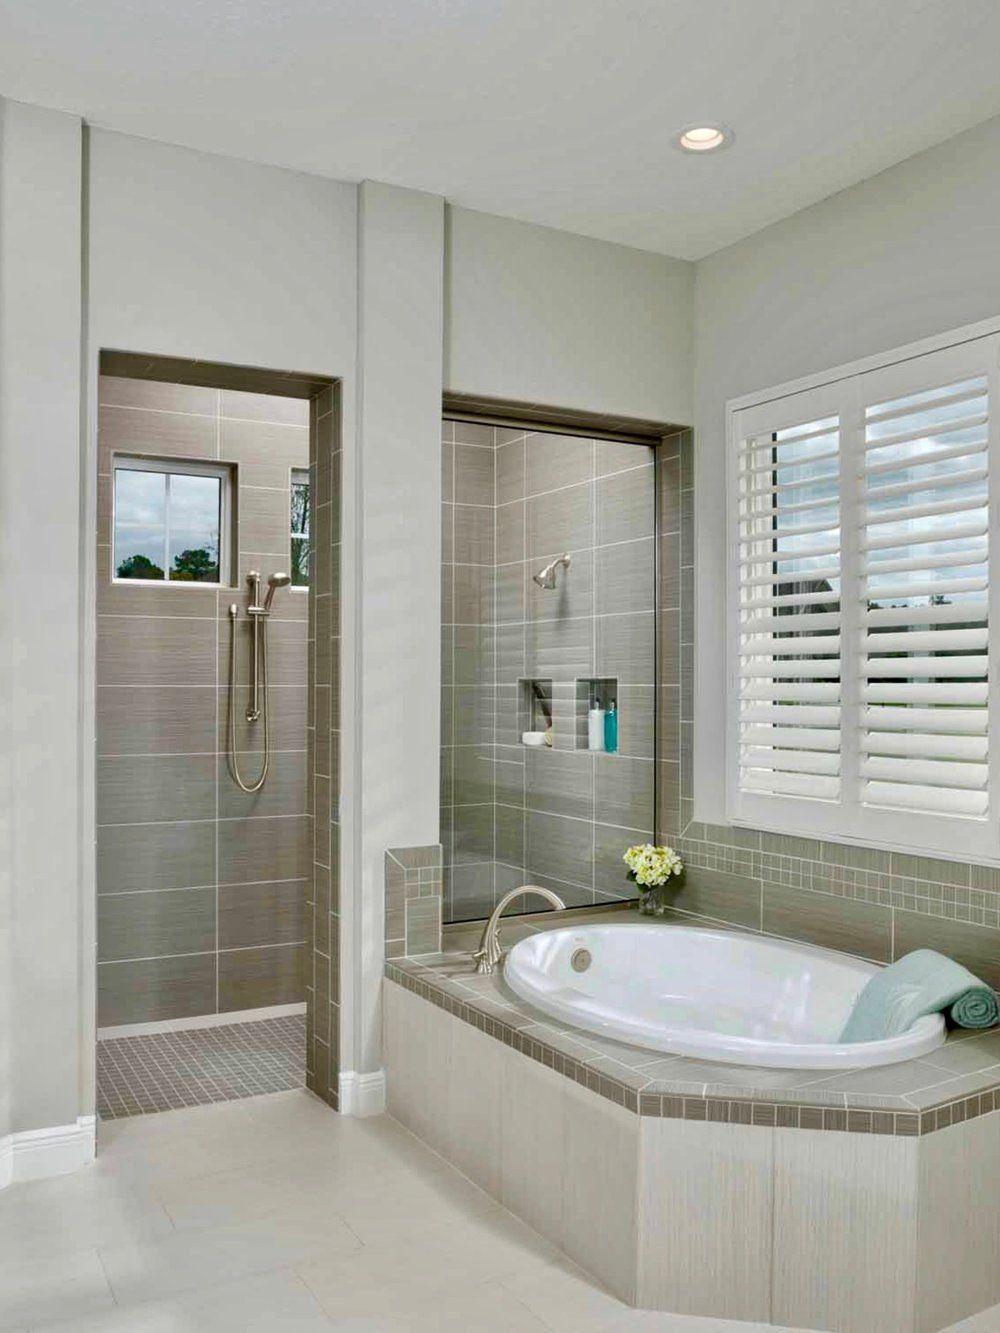 Master bedroom ensuite design   Arousing Master Bathroom Designs  New home  Pinterest